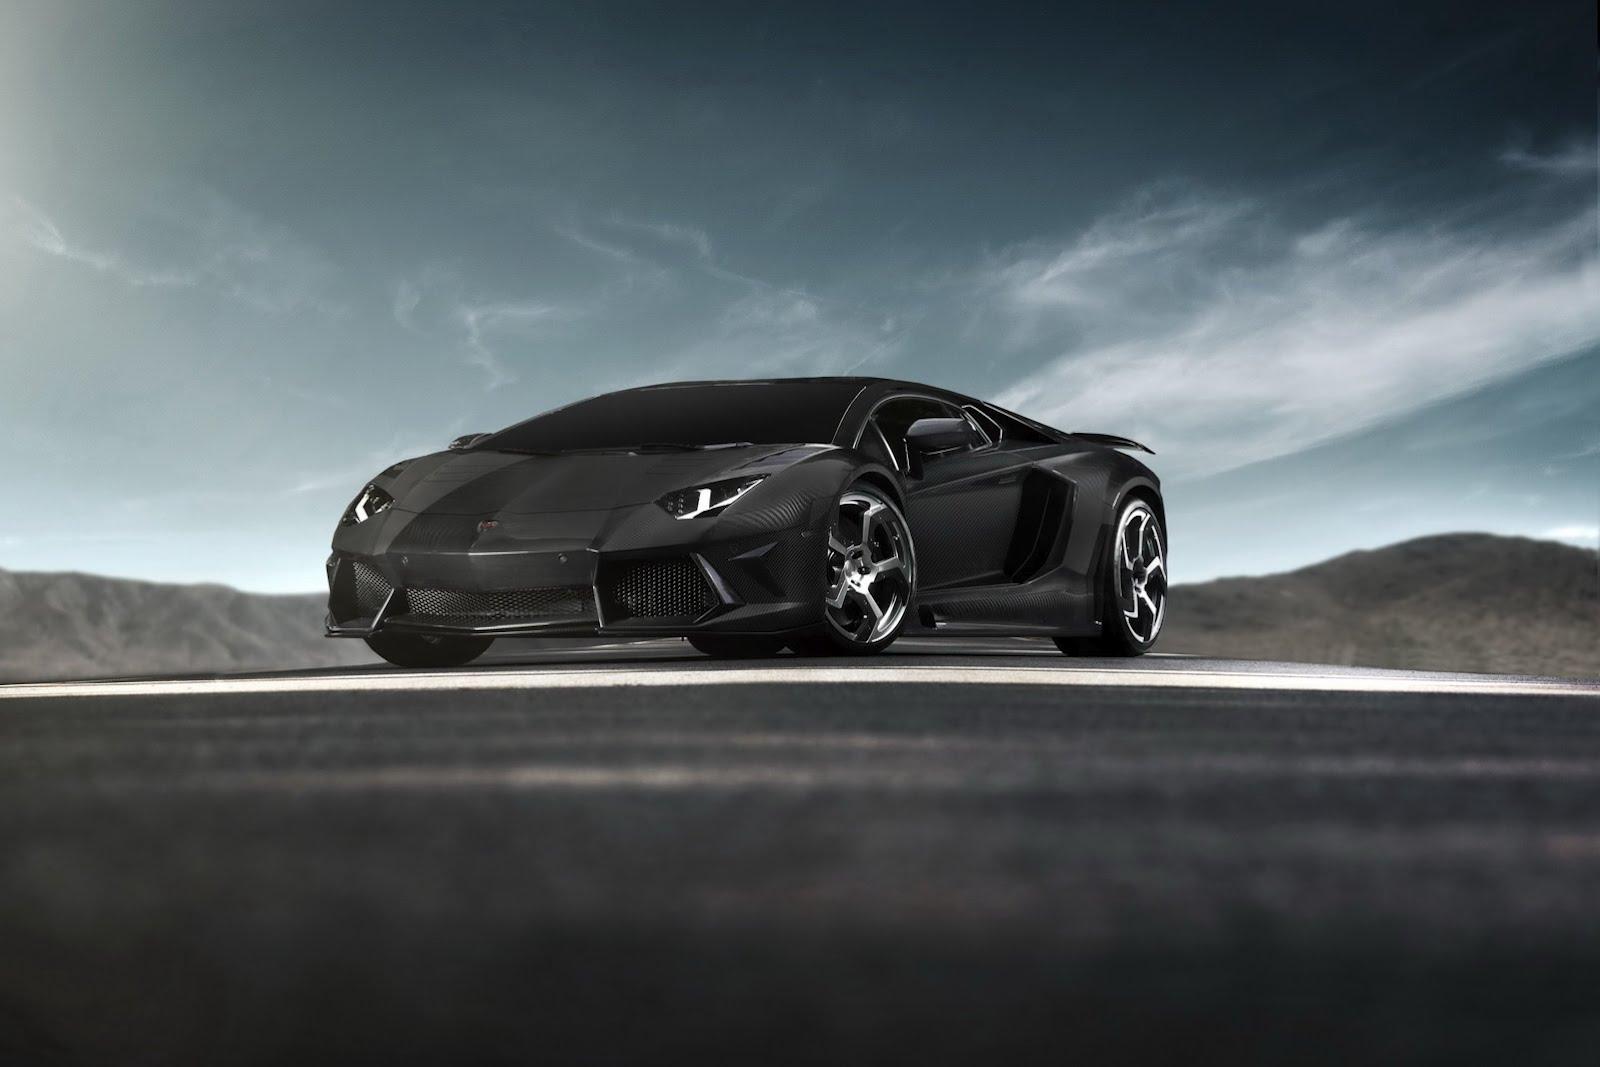 Mansory dresses Lamborghini Aventador in Carbon Fiber